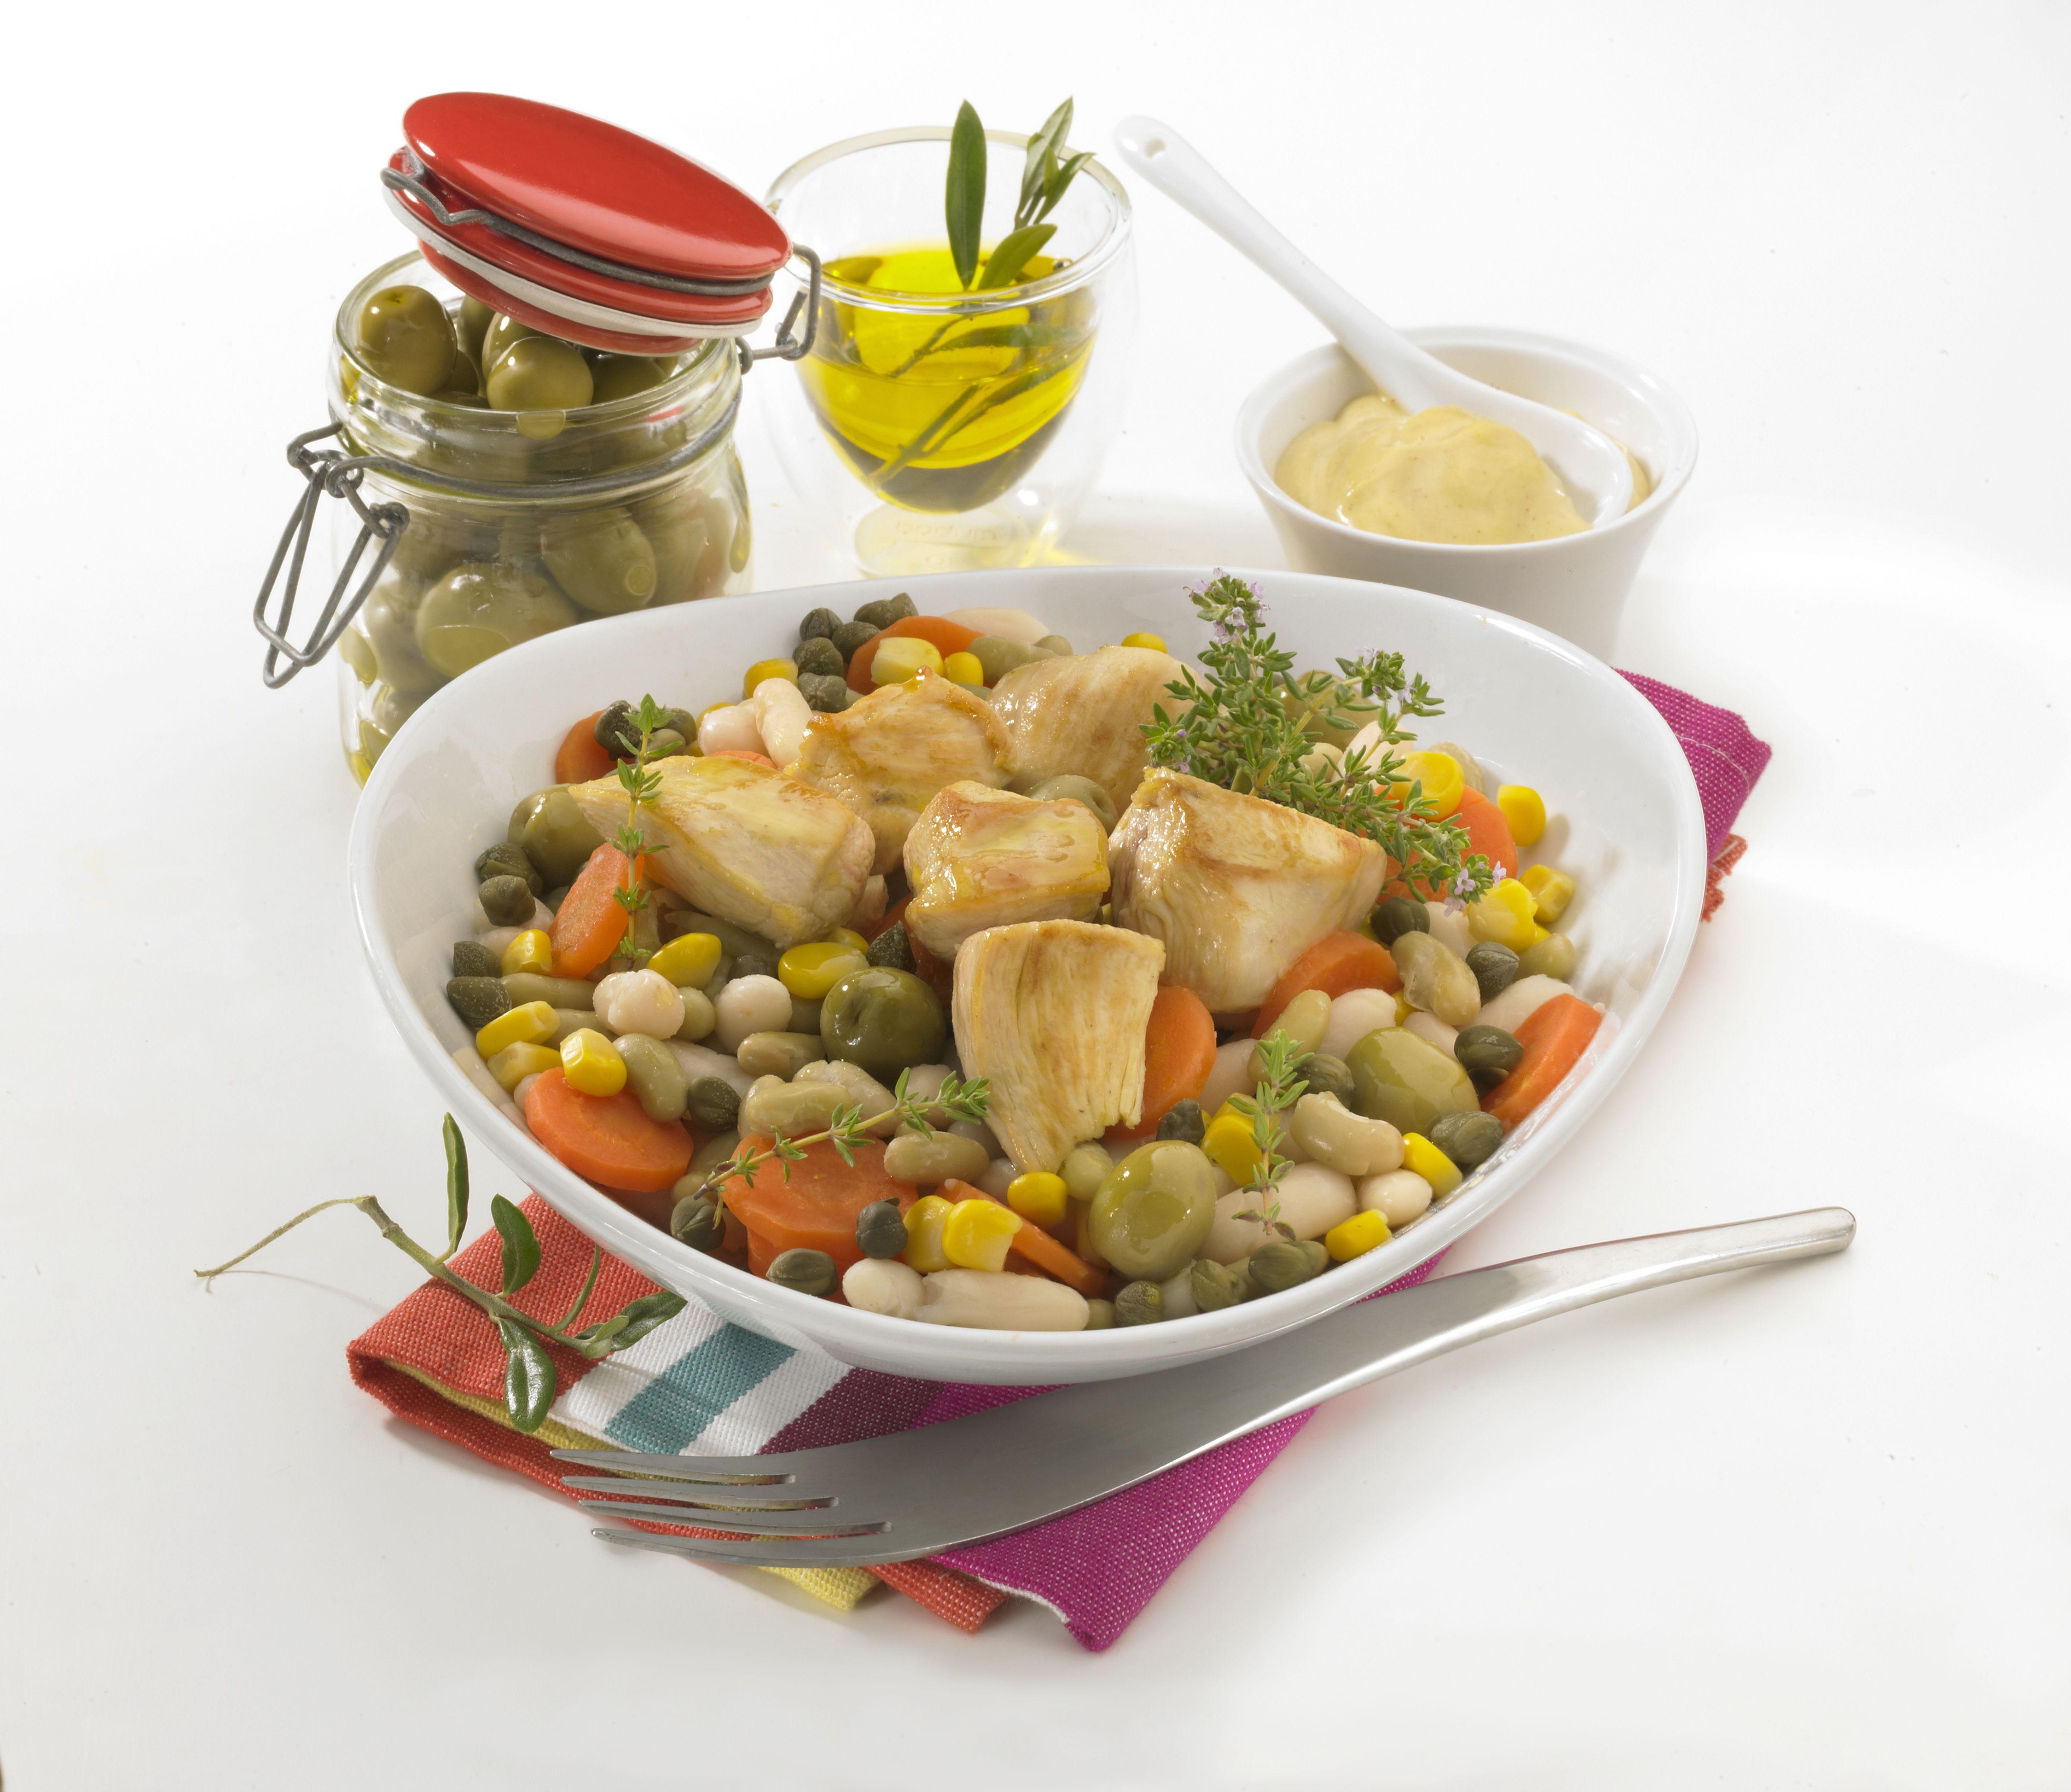 salade m diterran enne aux olives plat sain et quilibr pour maigrir et perdre du poids. Black Bedroom Furniture Sets. Home Design Ideas